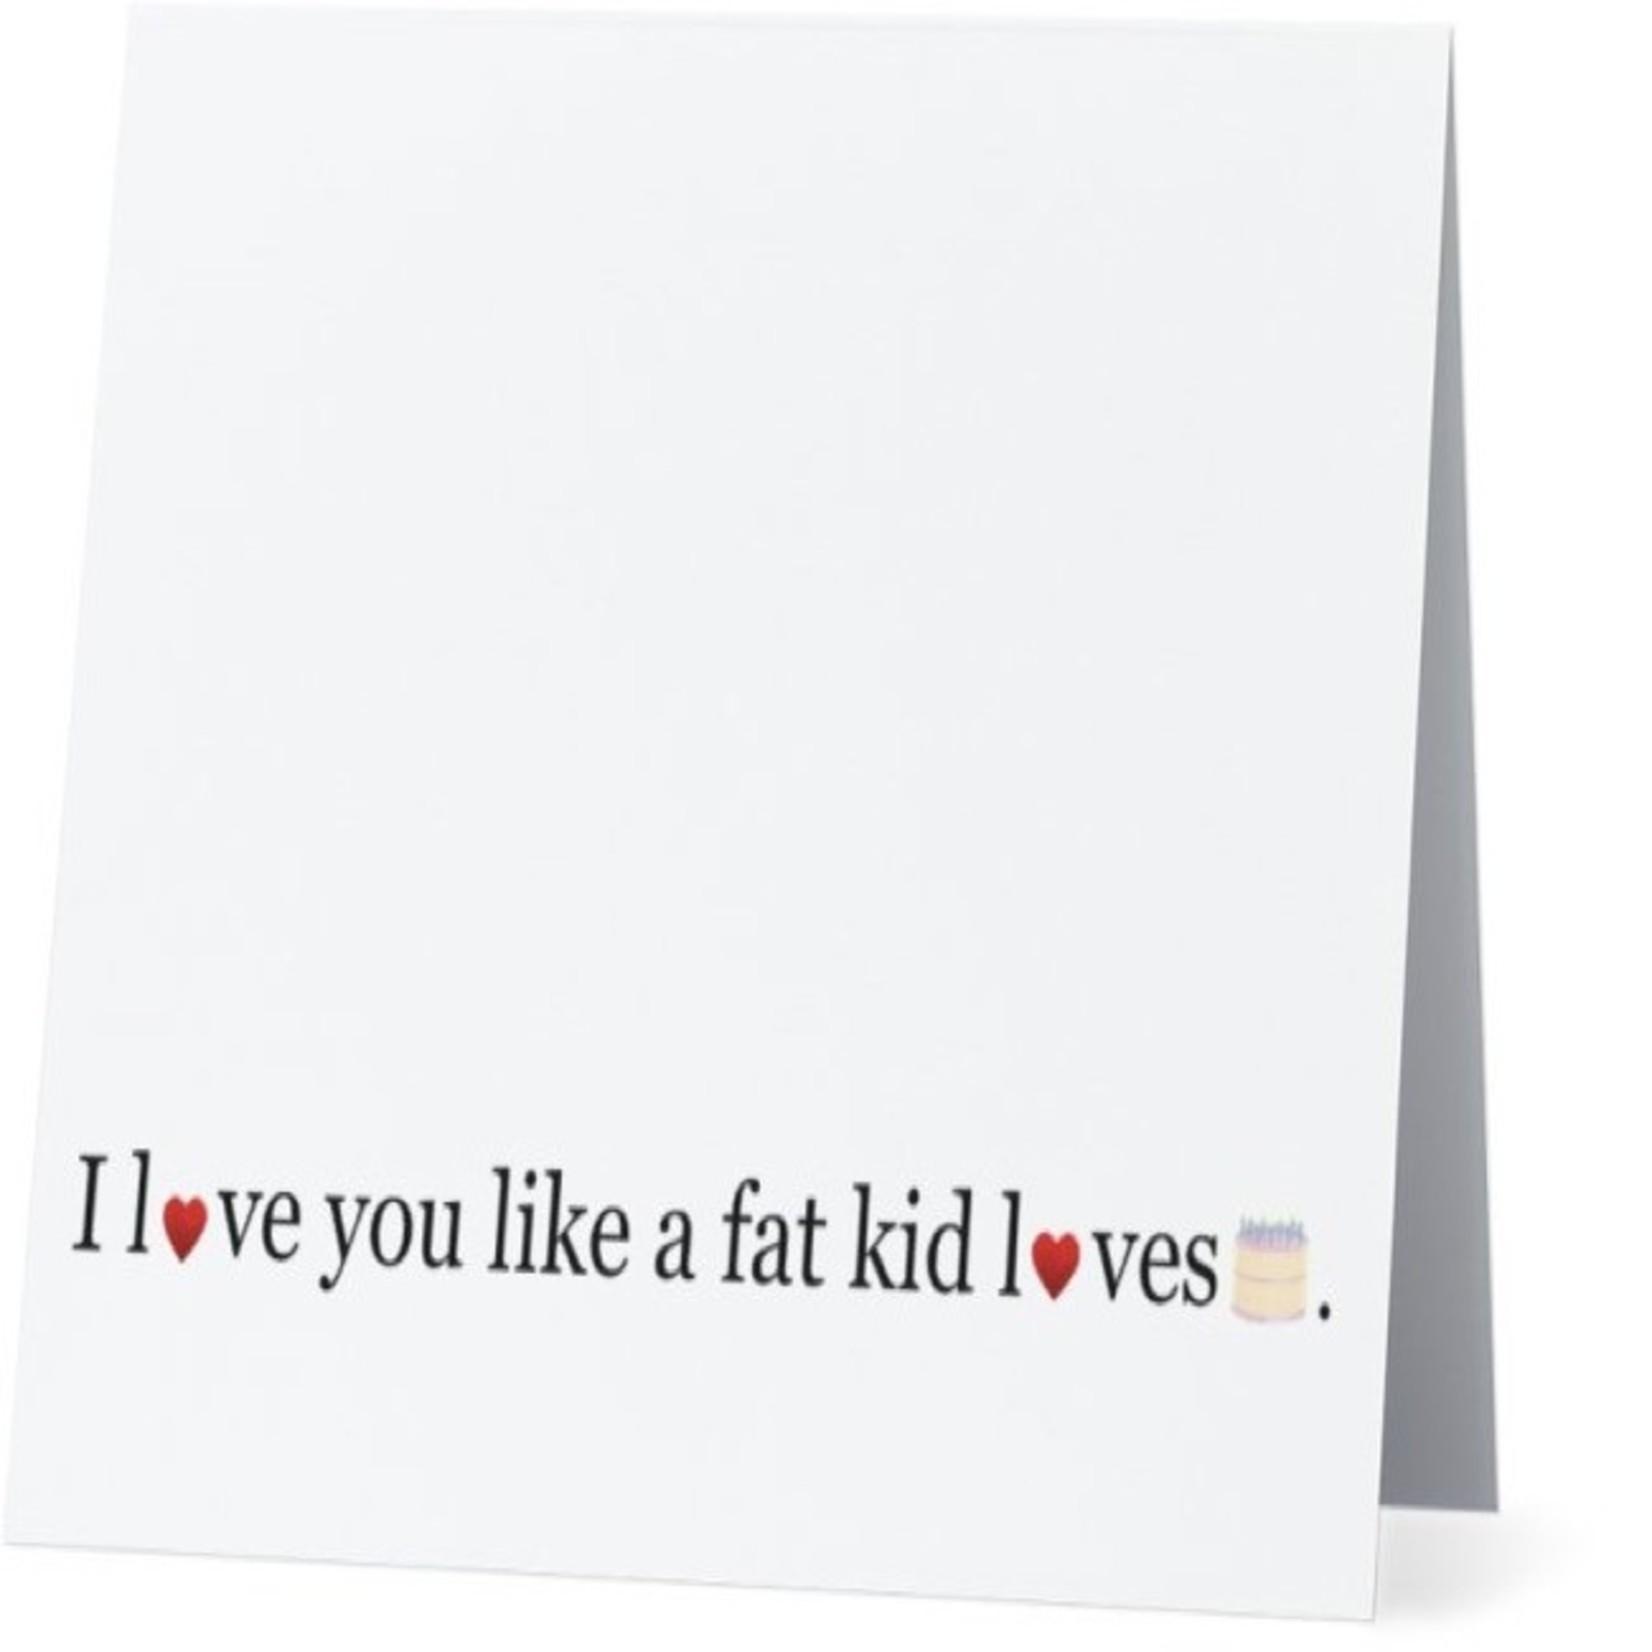 Bad Annie's Card #007 - Love You Like A Fat Kid Loves Cake